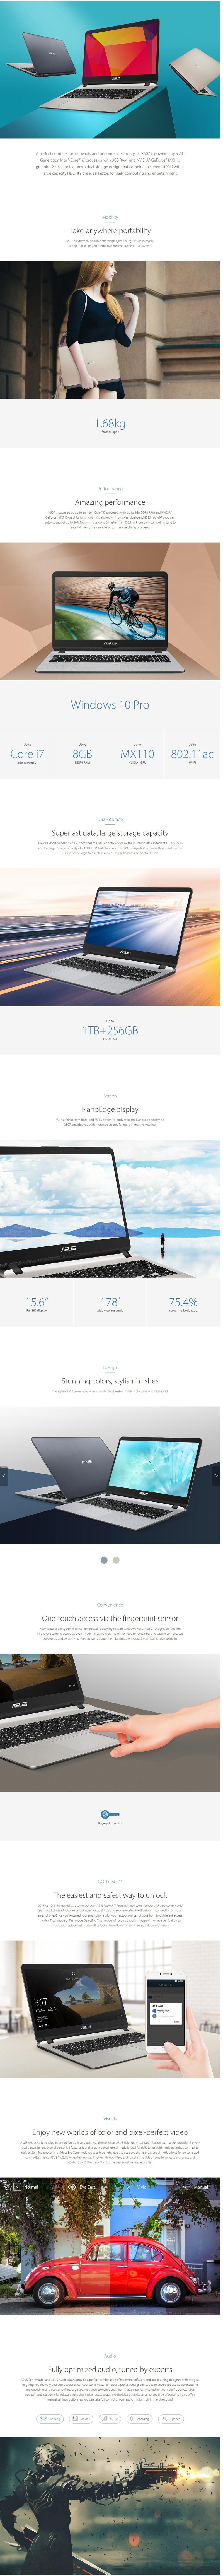 Asus Vivobook X507Ub Notebook 15 6